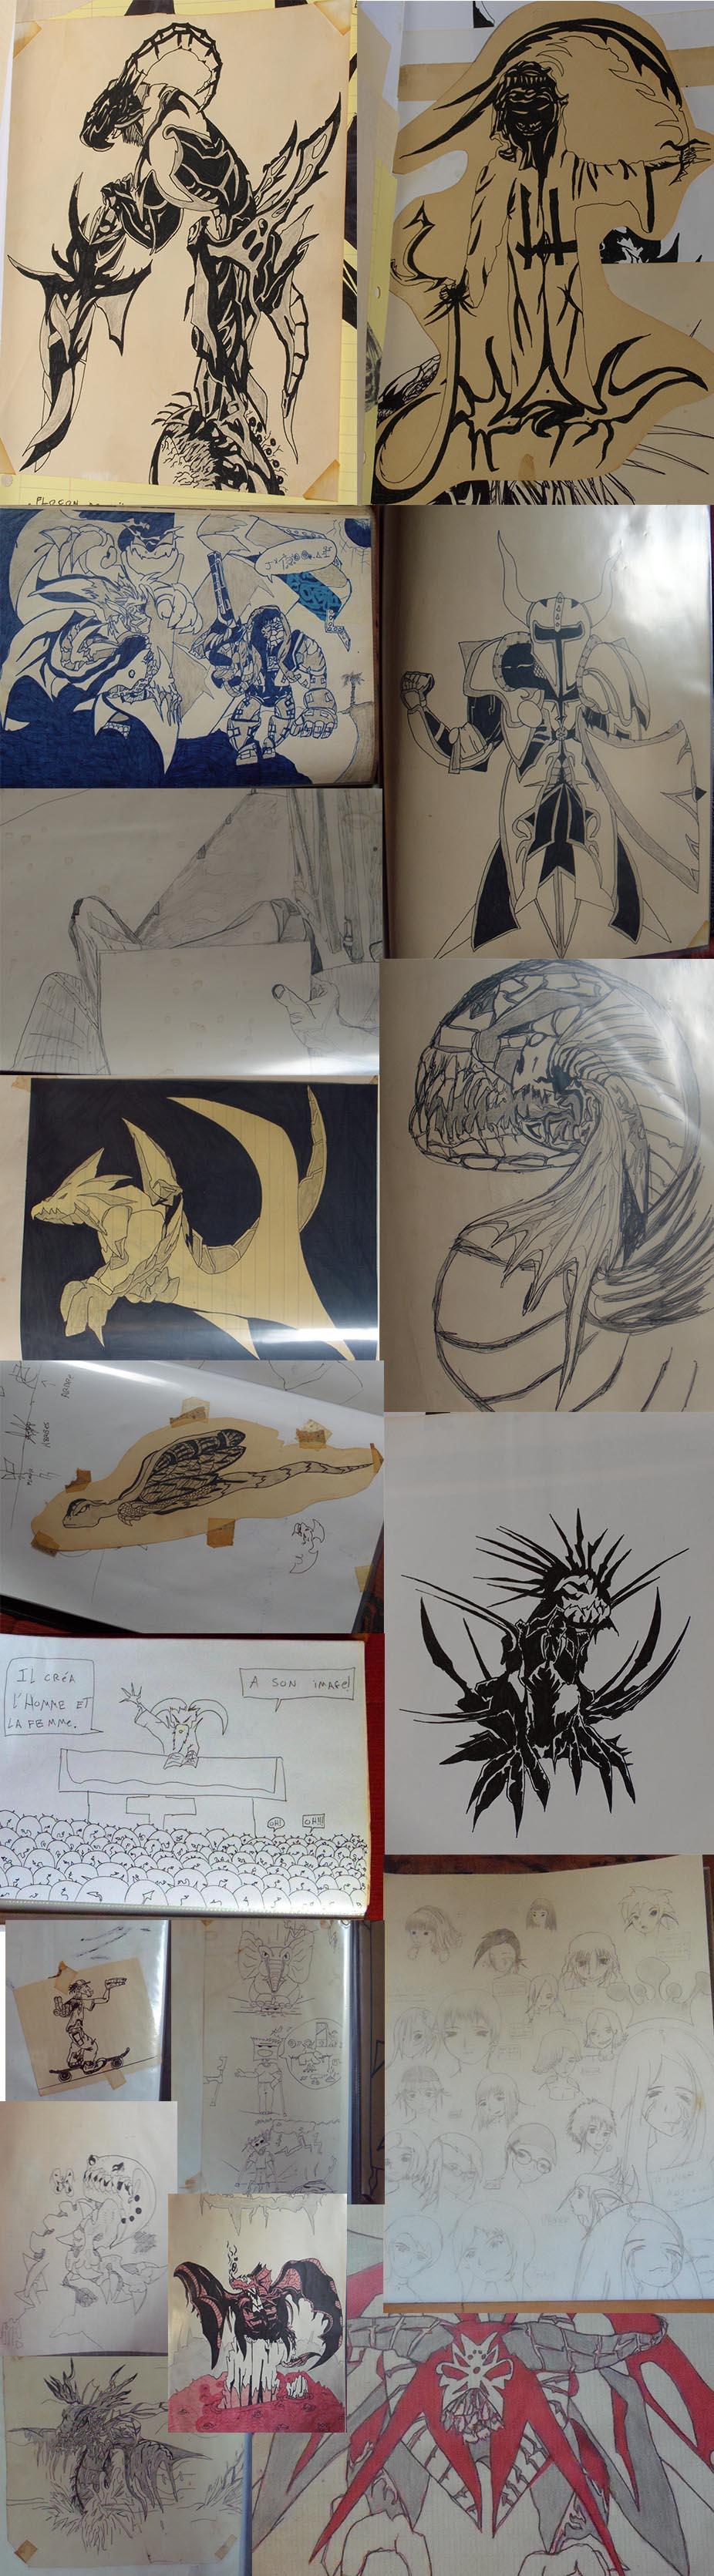 [inspi] Timeline - vos vieux dessins - Page 4 Archiv11